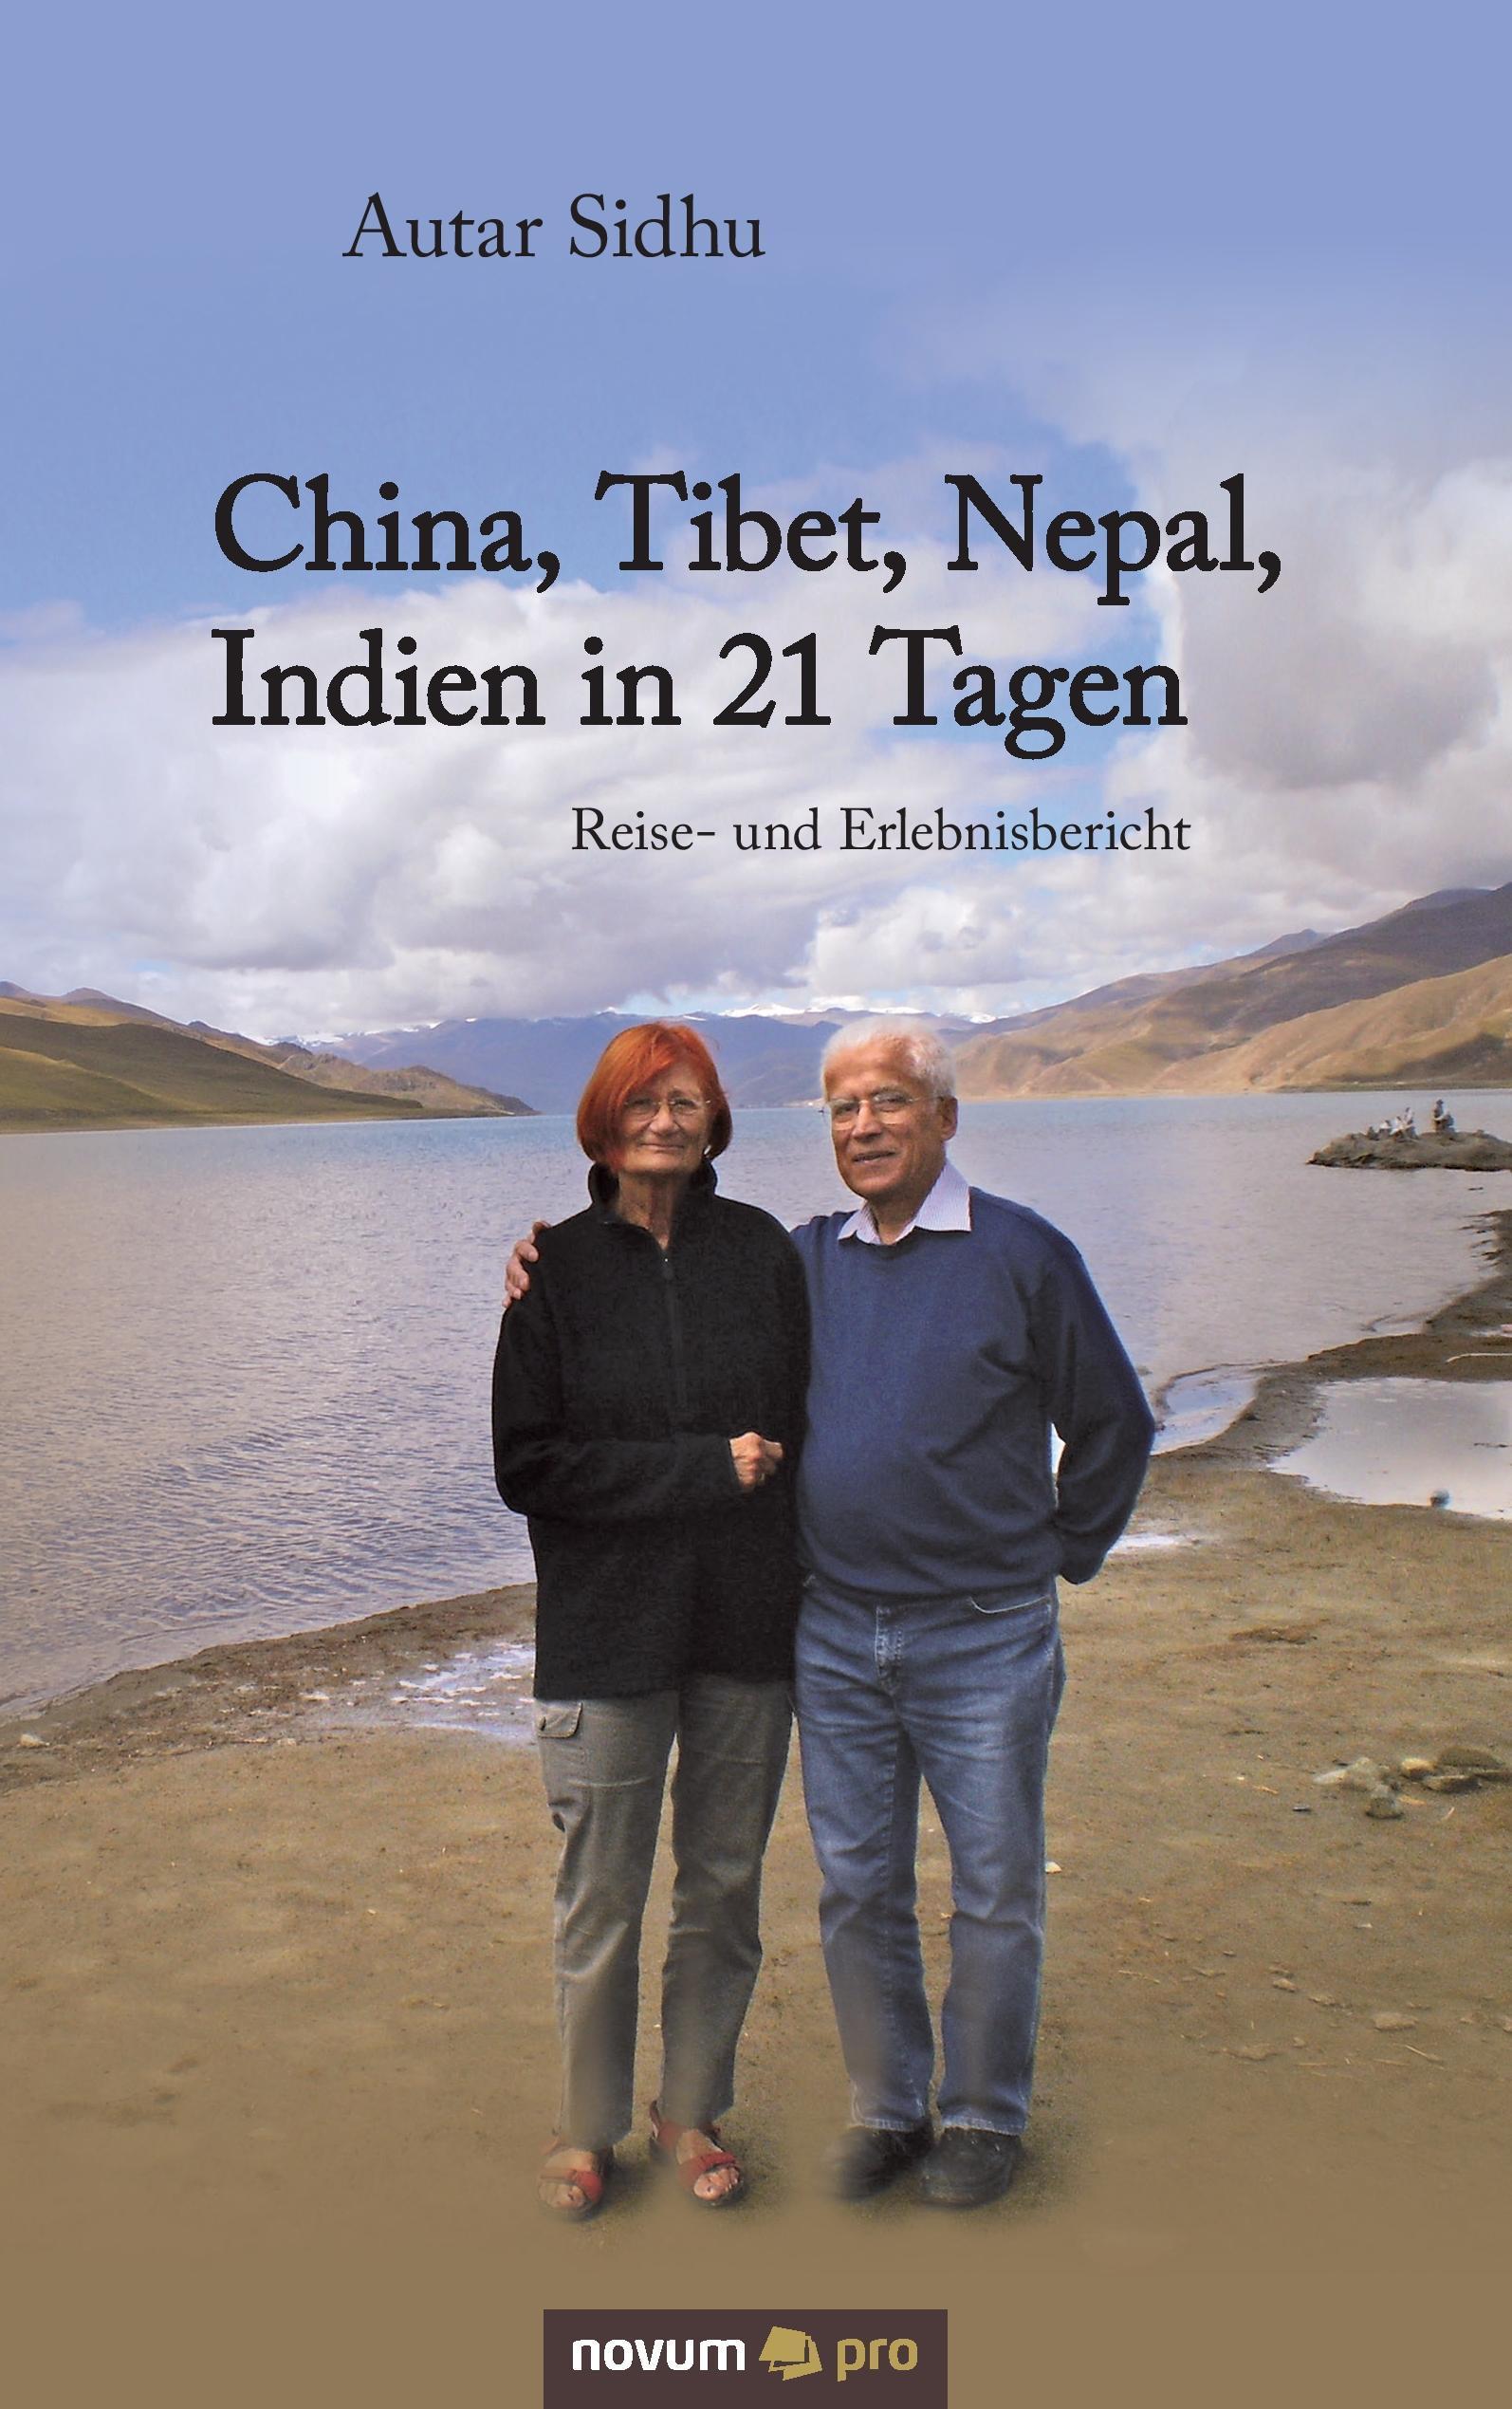 China, Tibet, Nepal, Indien in 21 Tagen, Autar Sidhu